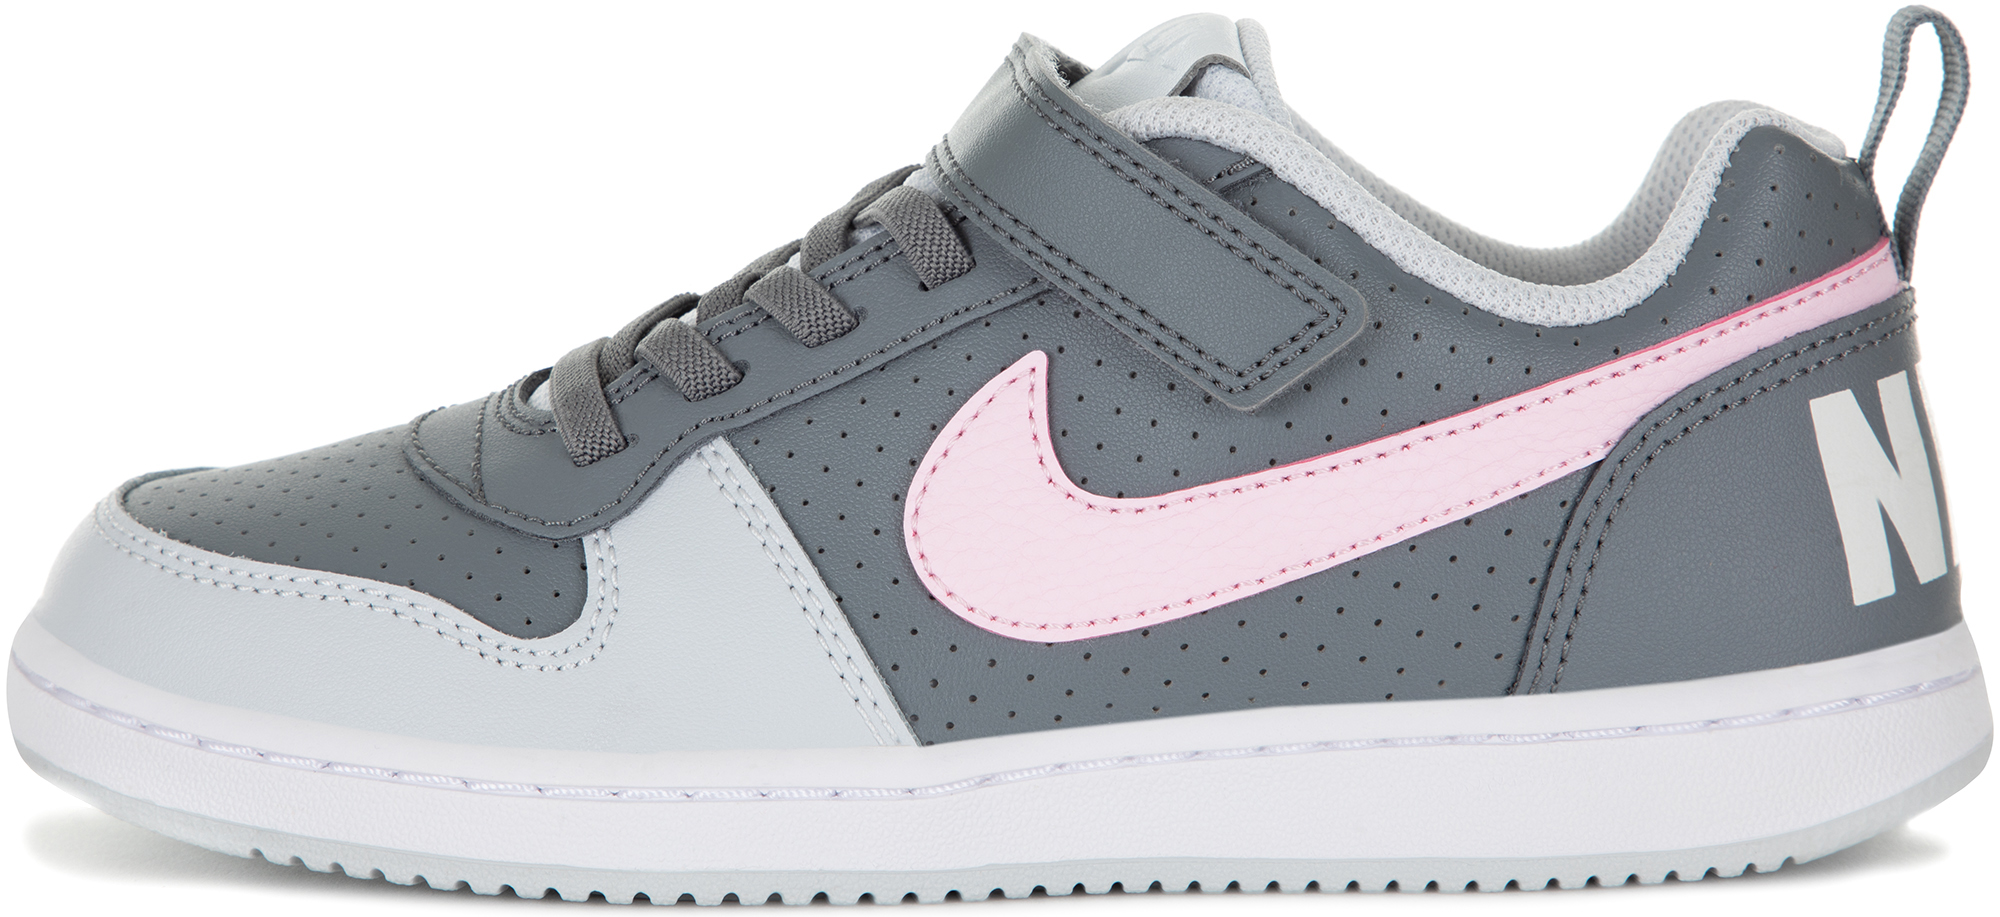 Nike Кеды для девочек Nike Court Borough Low, размер 34 гардероб austrian court